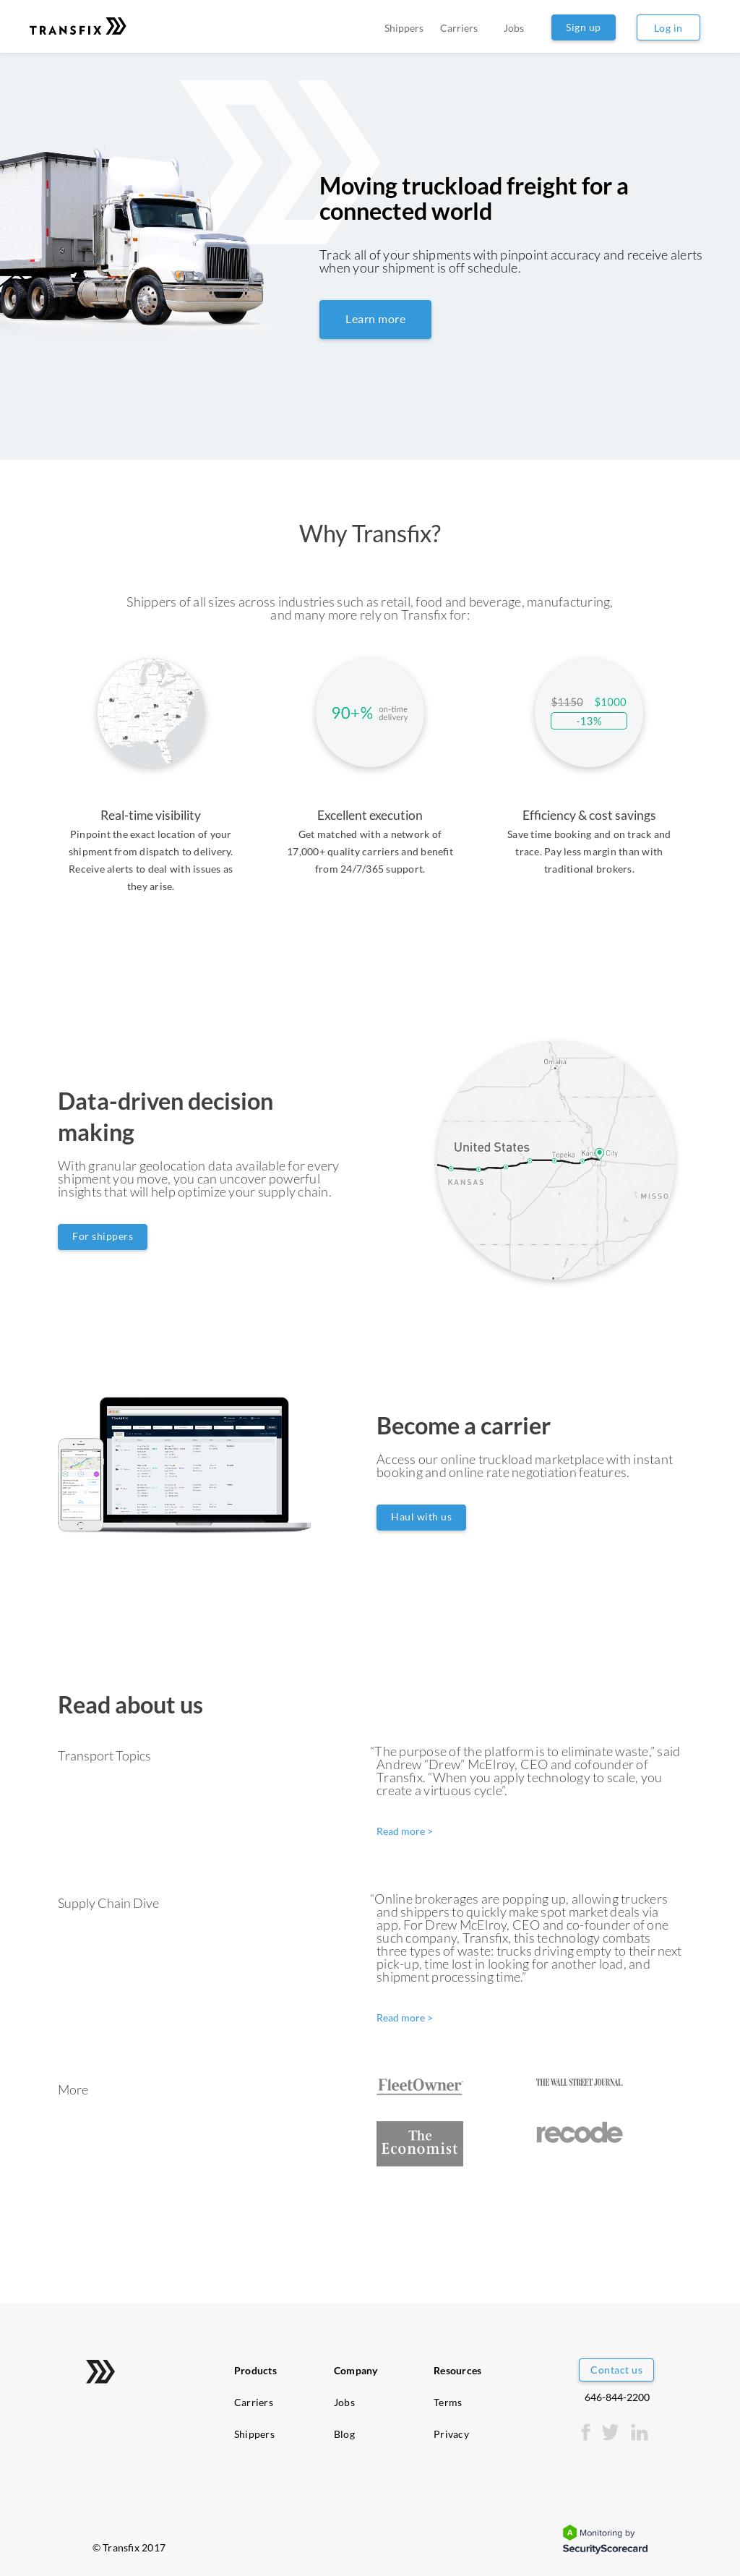 Transfix Competitors, Revenue and Employees - Owler Company Profile